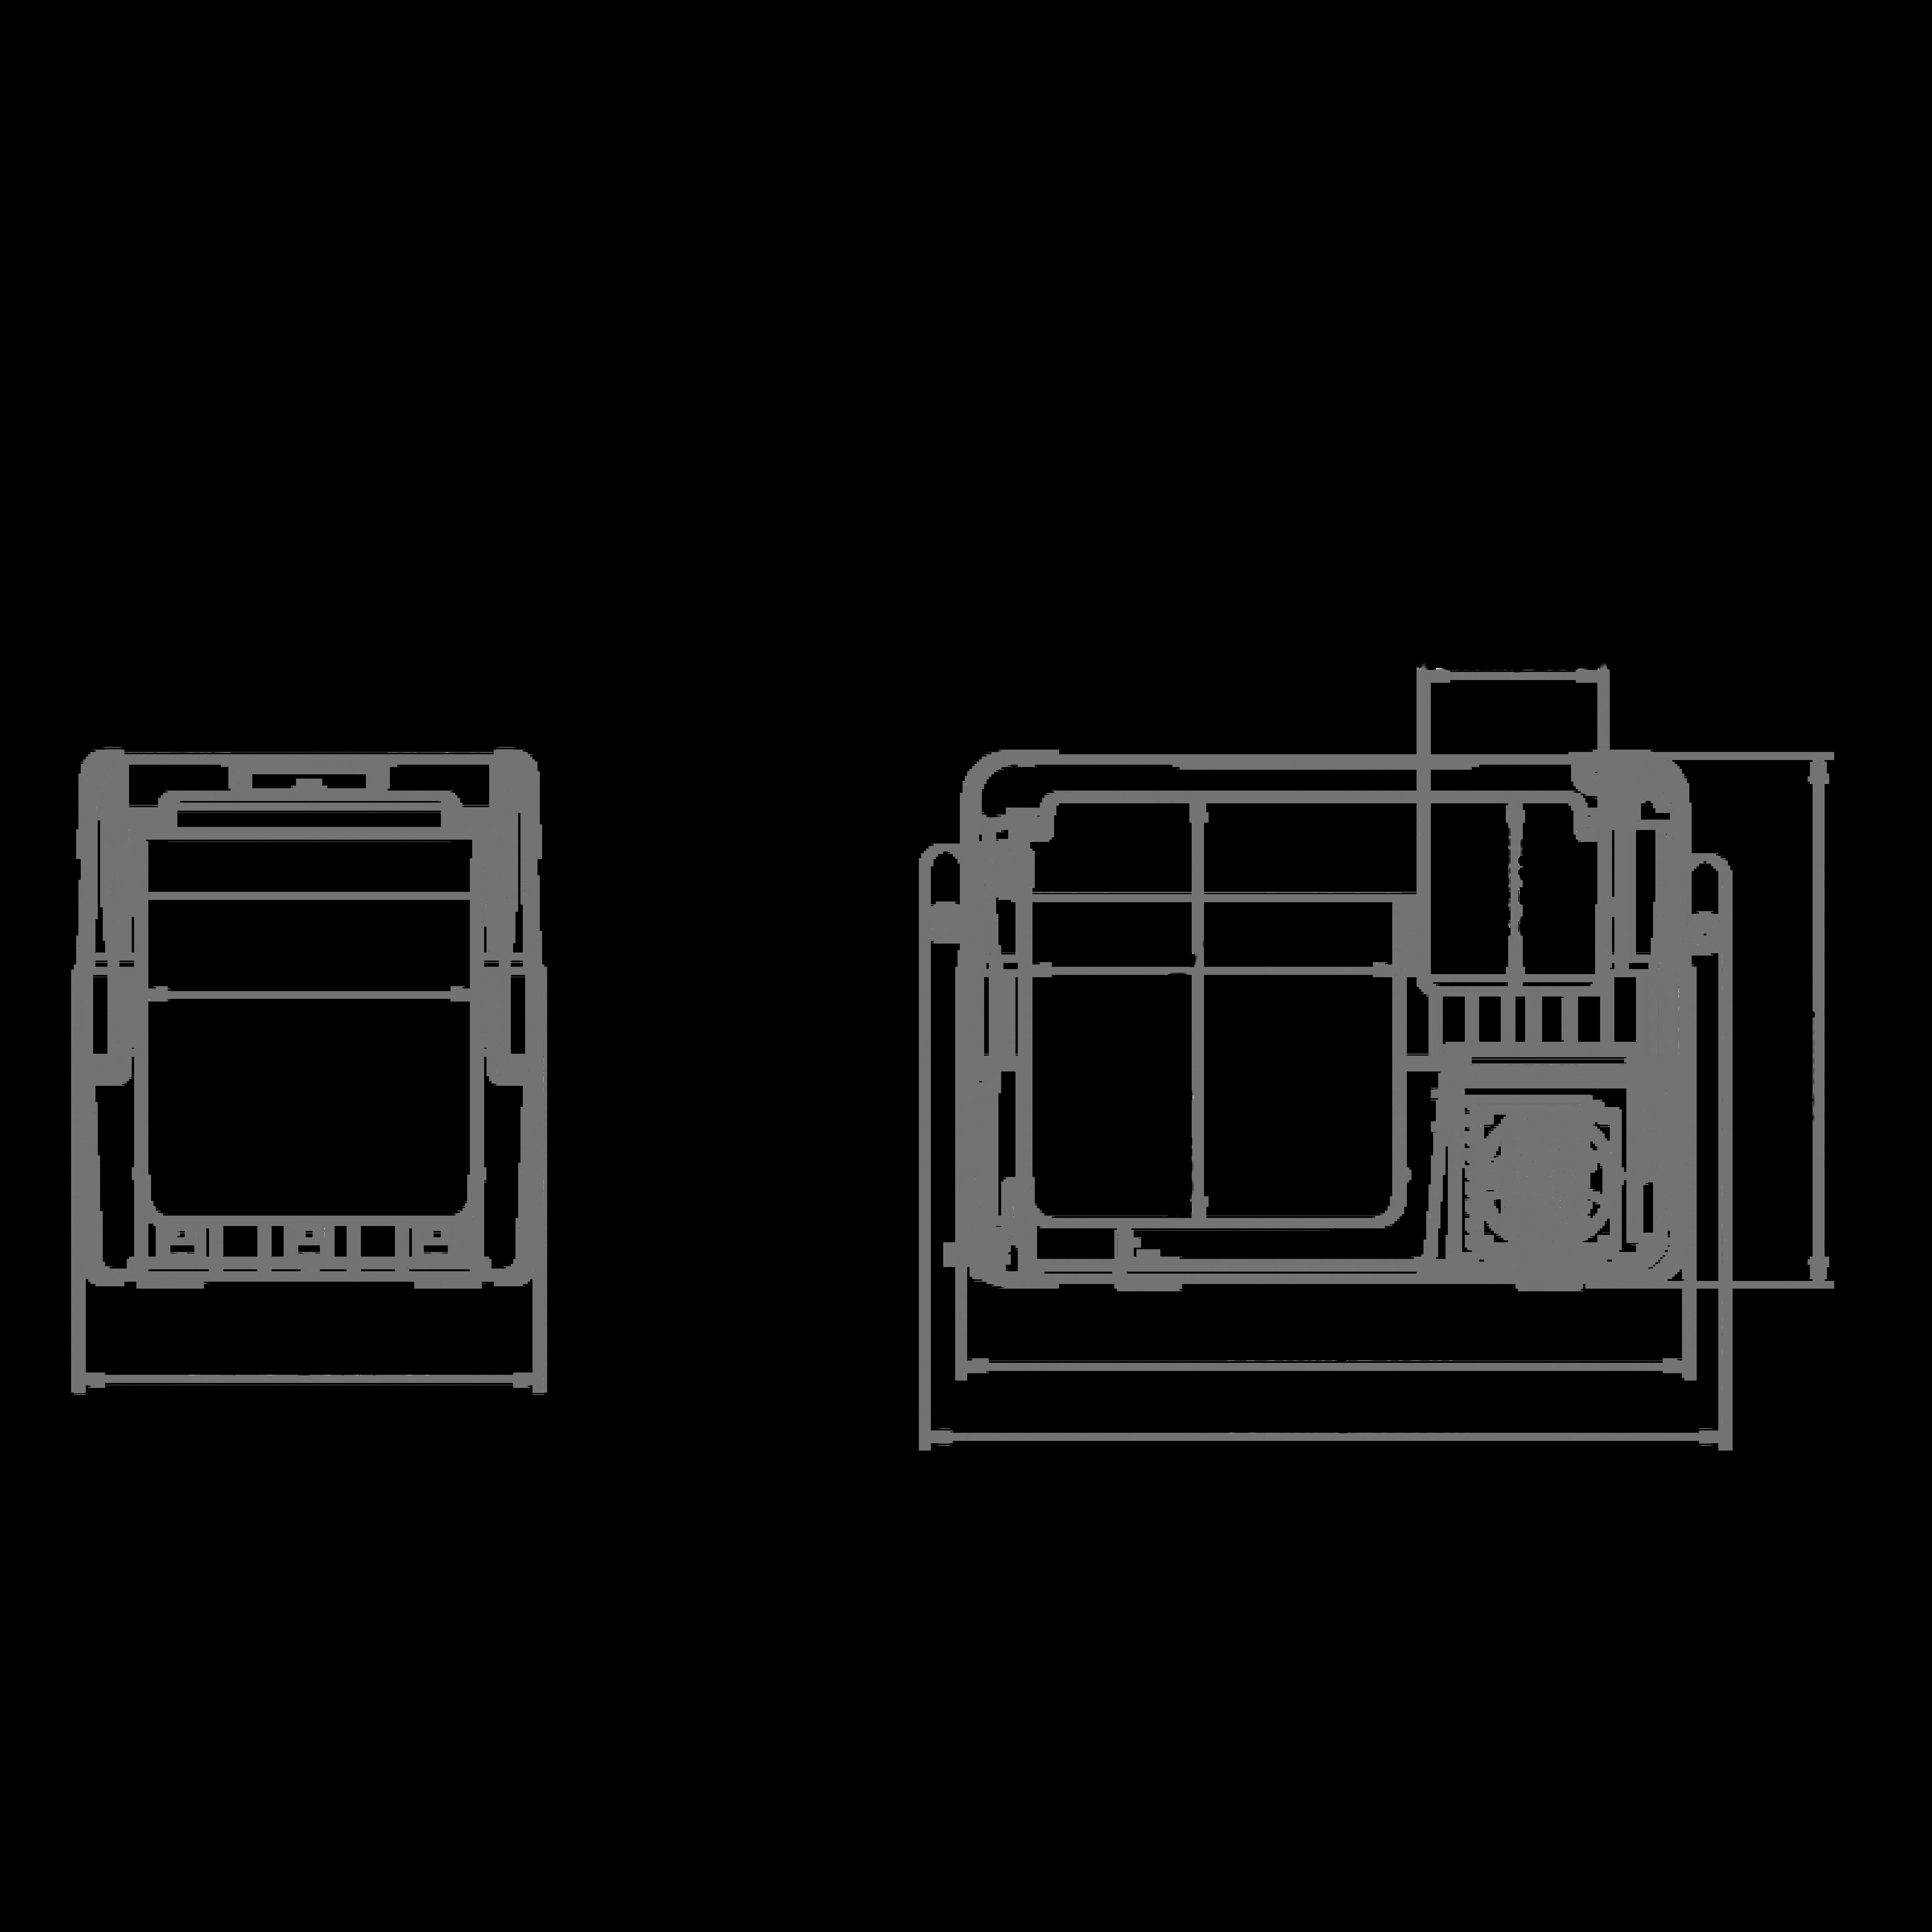 CFX 40W Dimensions